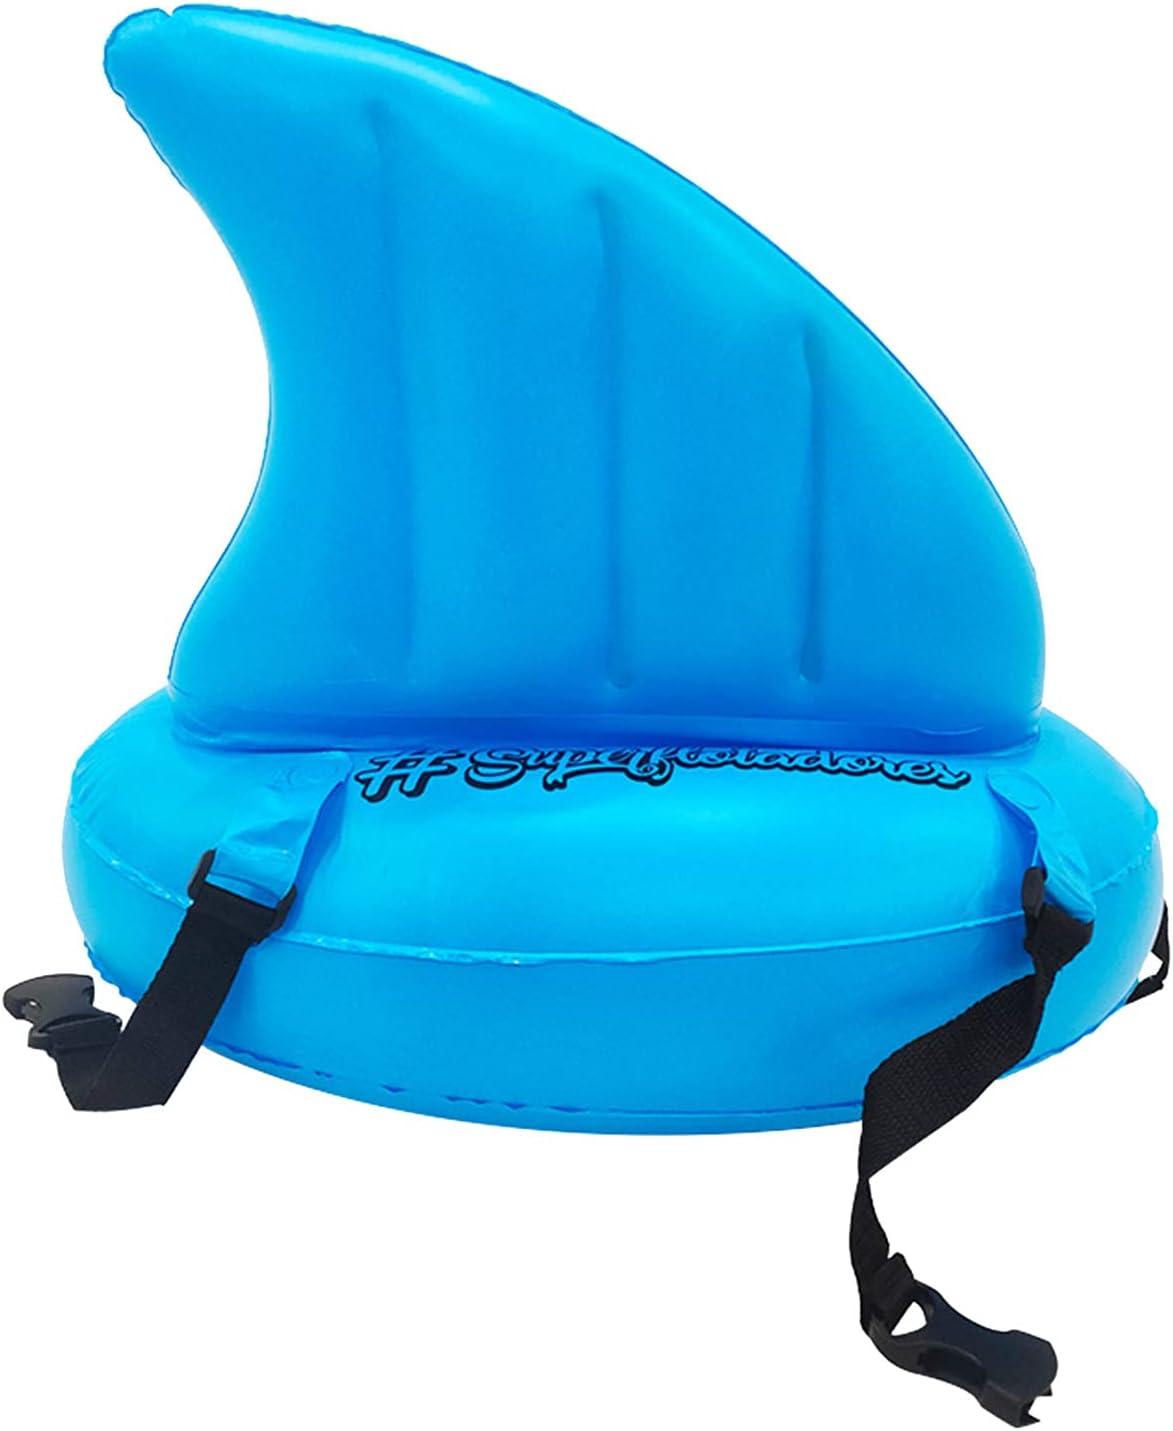 Inflatable Shark Fin Floatation Belt, Swim Training Aid for Begi